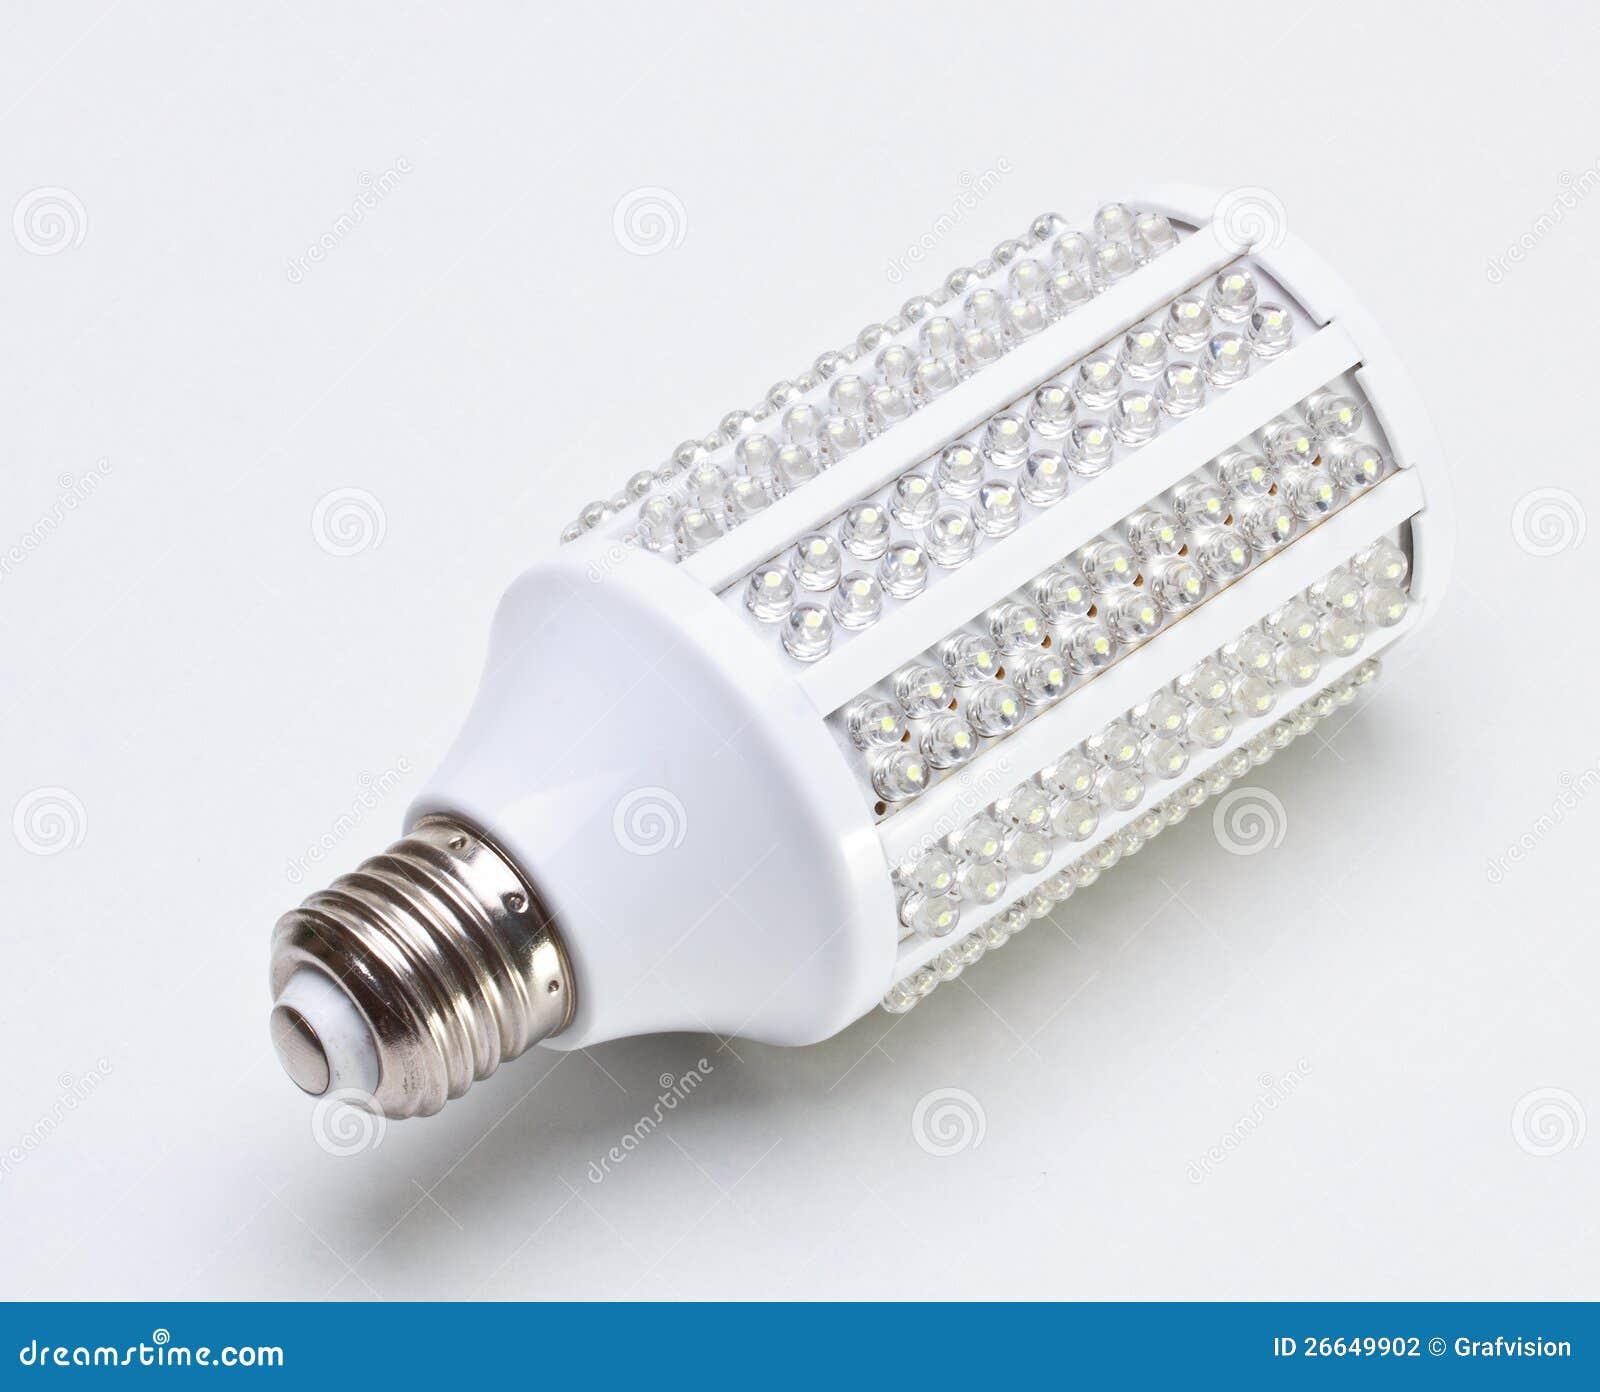 led light bulb stock photography image 26649902. Black Bedroom Furniture Sets. Home Design Ideas